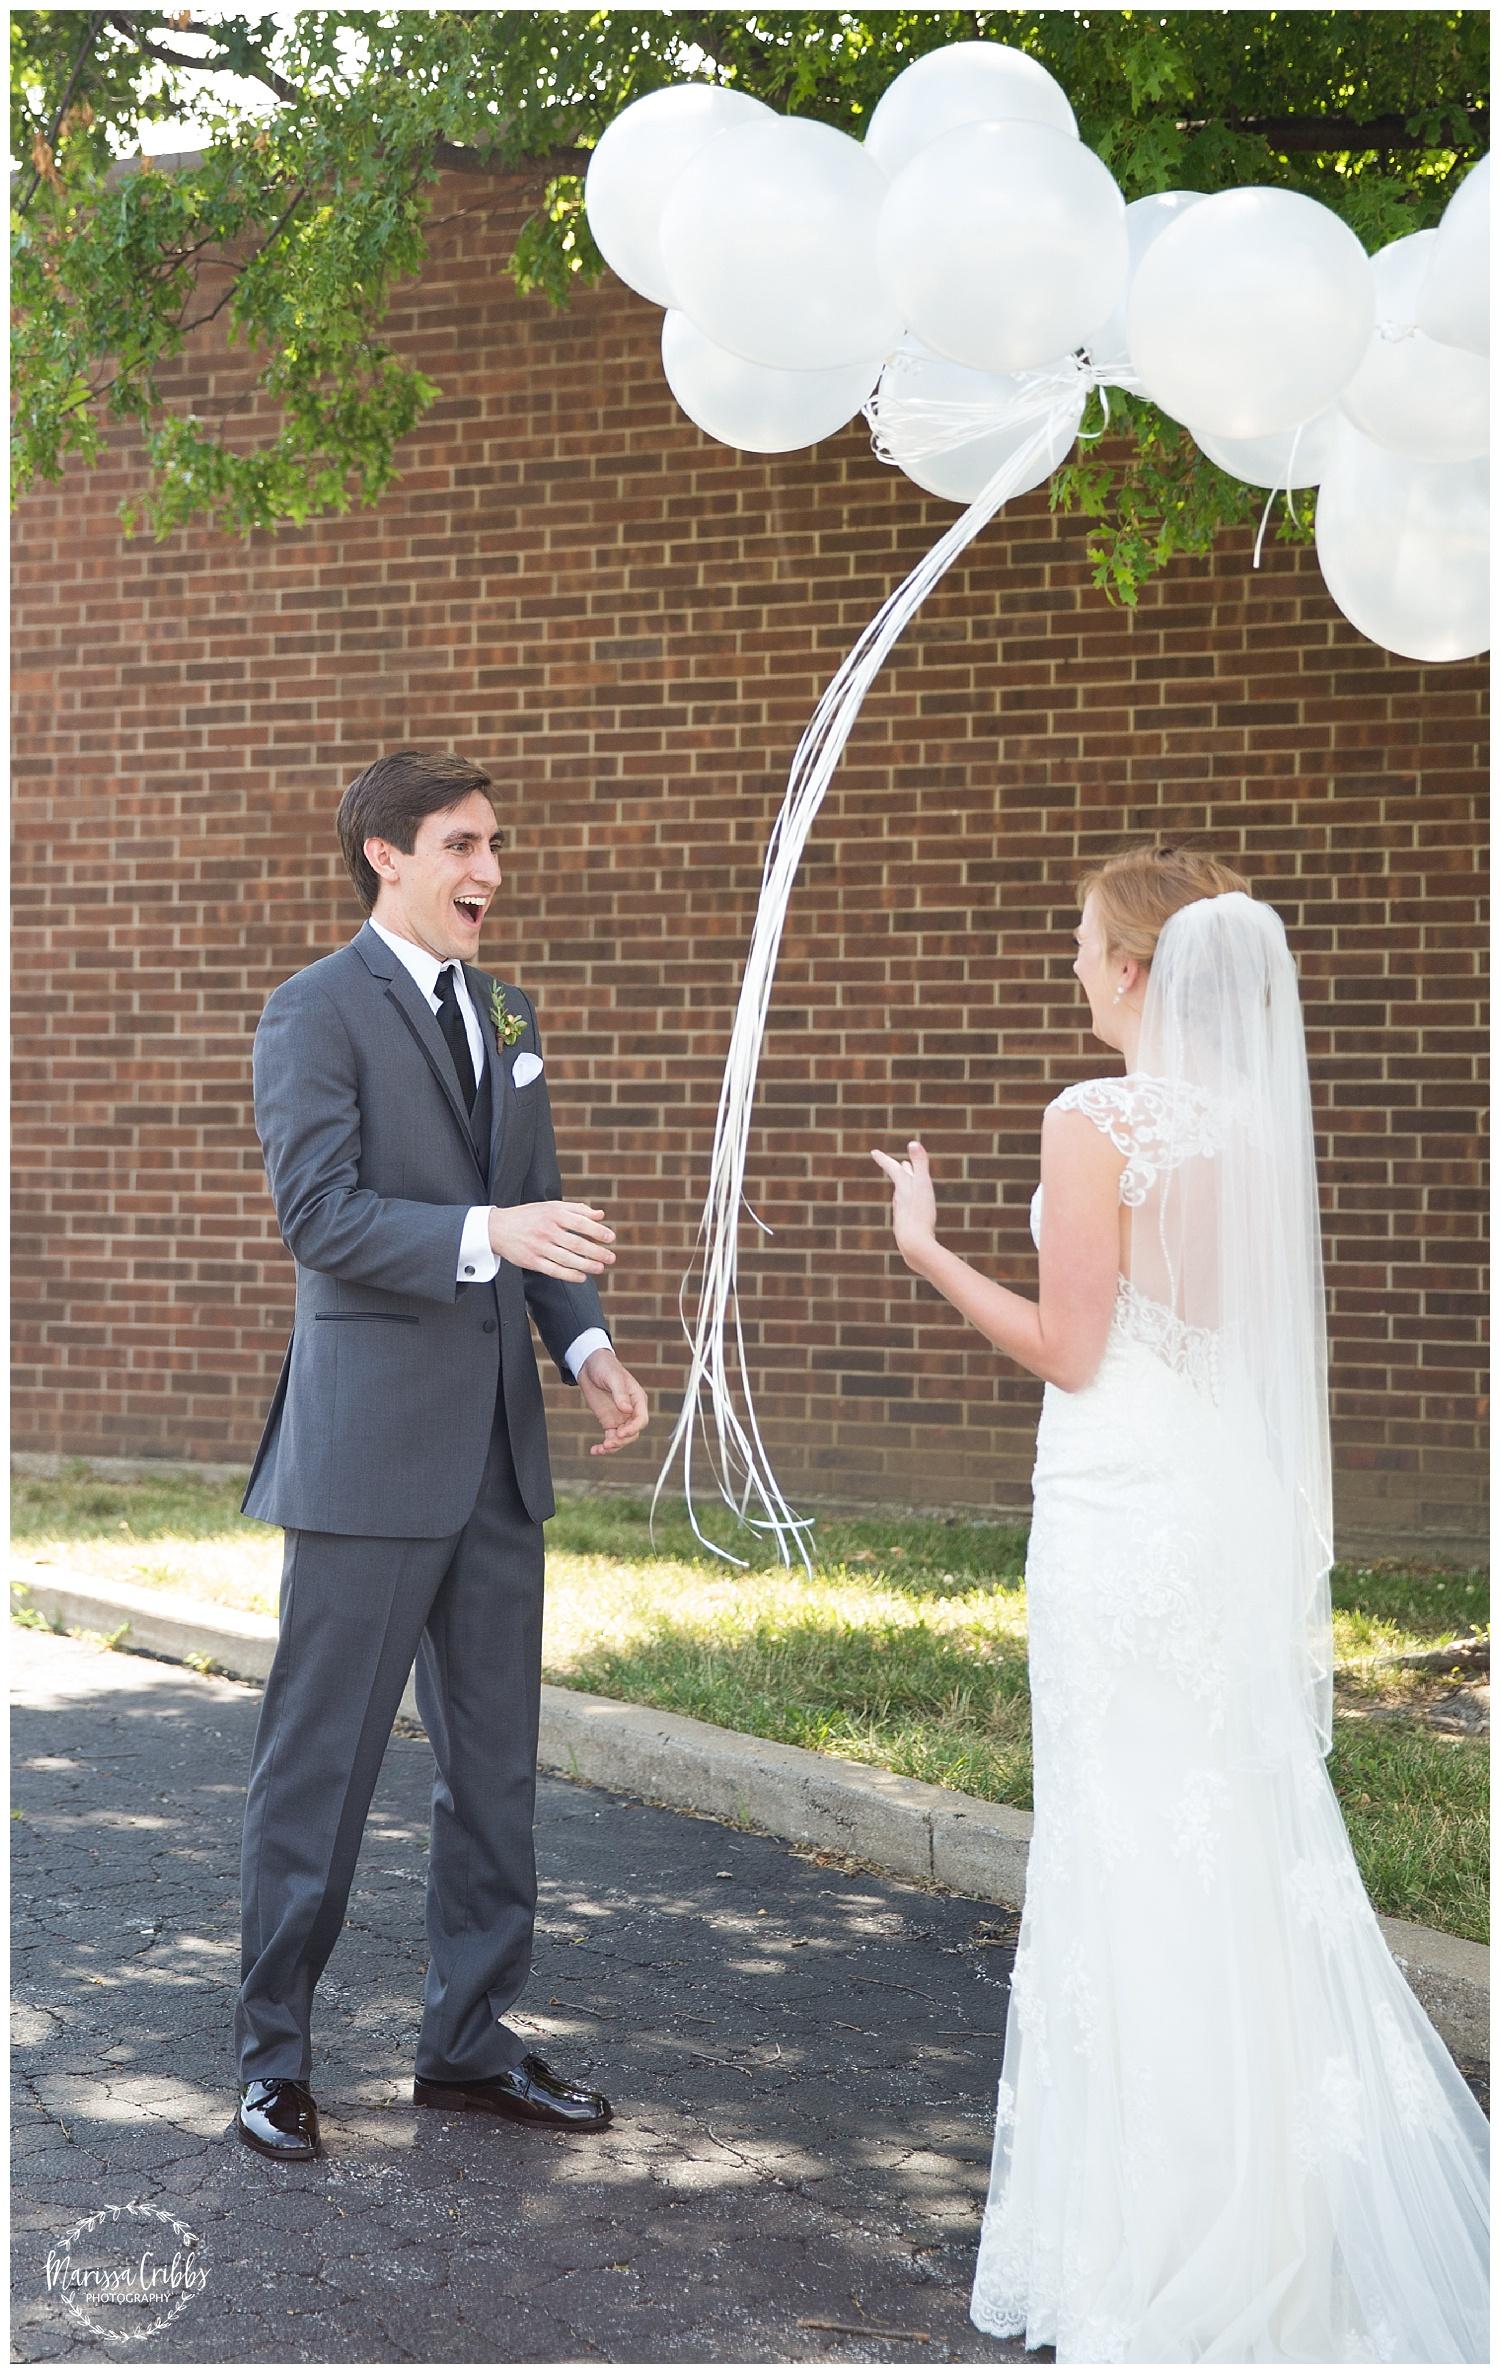 Twin Double Wedding | Union Horse Distilling Co. | Marissa Cribbs Photography | KC Weddings_0058.jpg